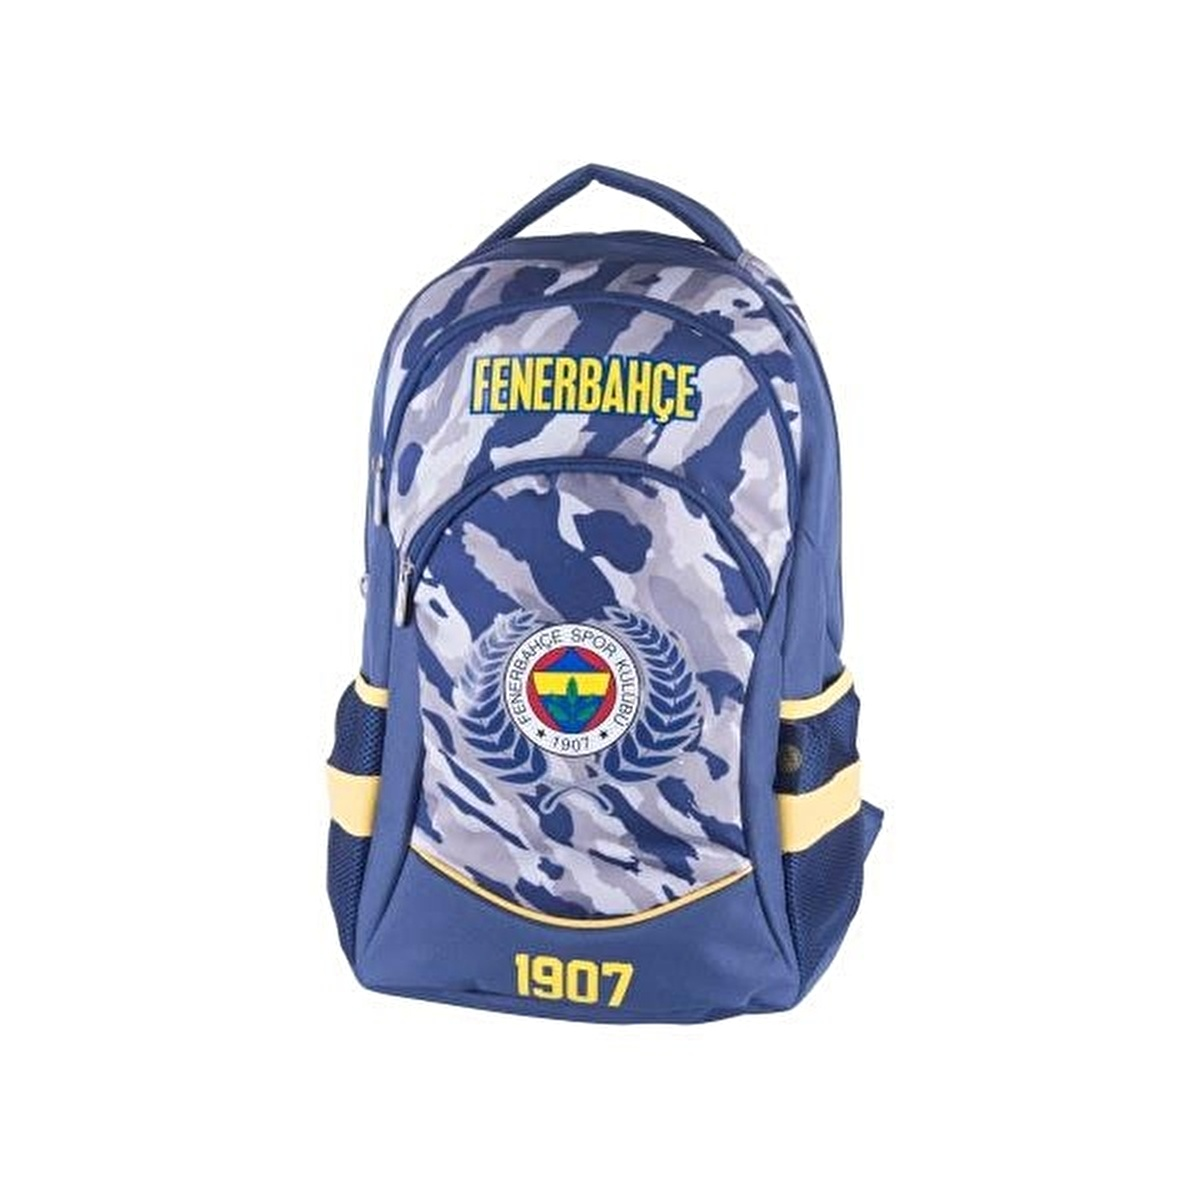 24e73928f9d3e Fenerbahçe Unisex Çocuk Okul Çantası Lacivert Sarı | Morhipo | 19746626